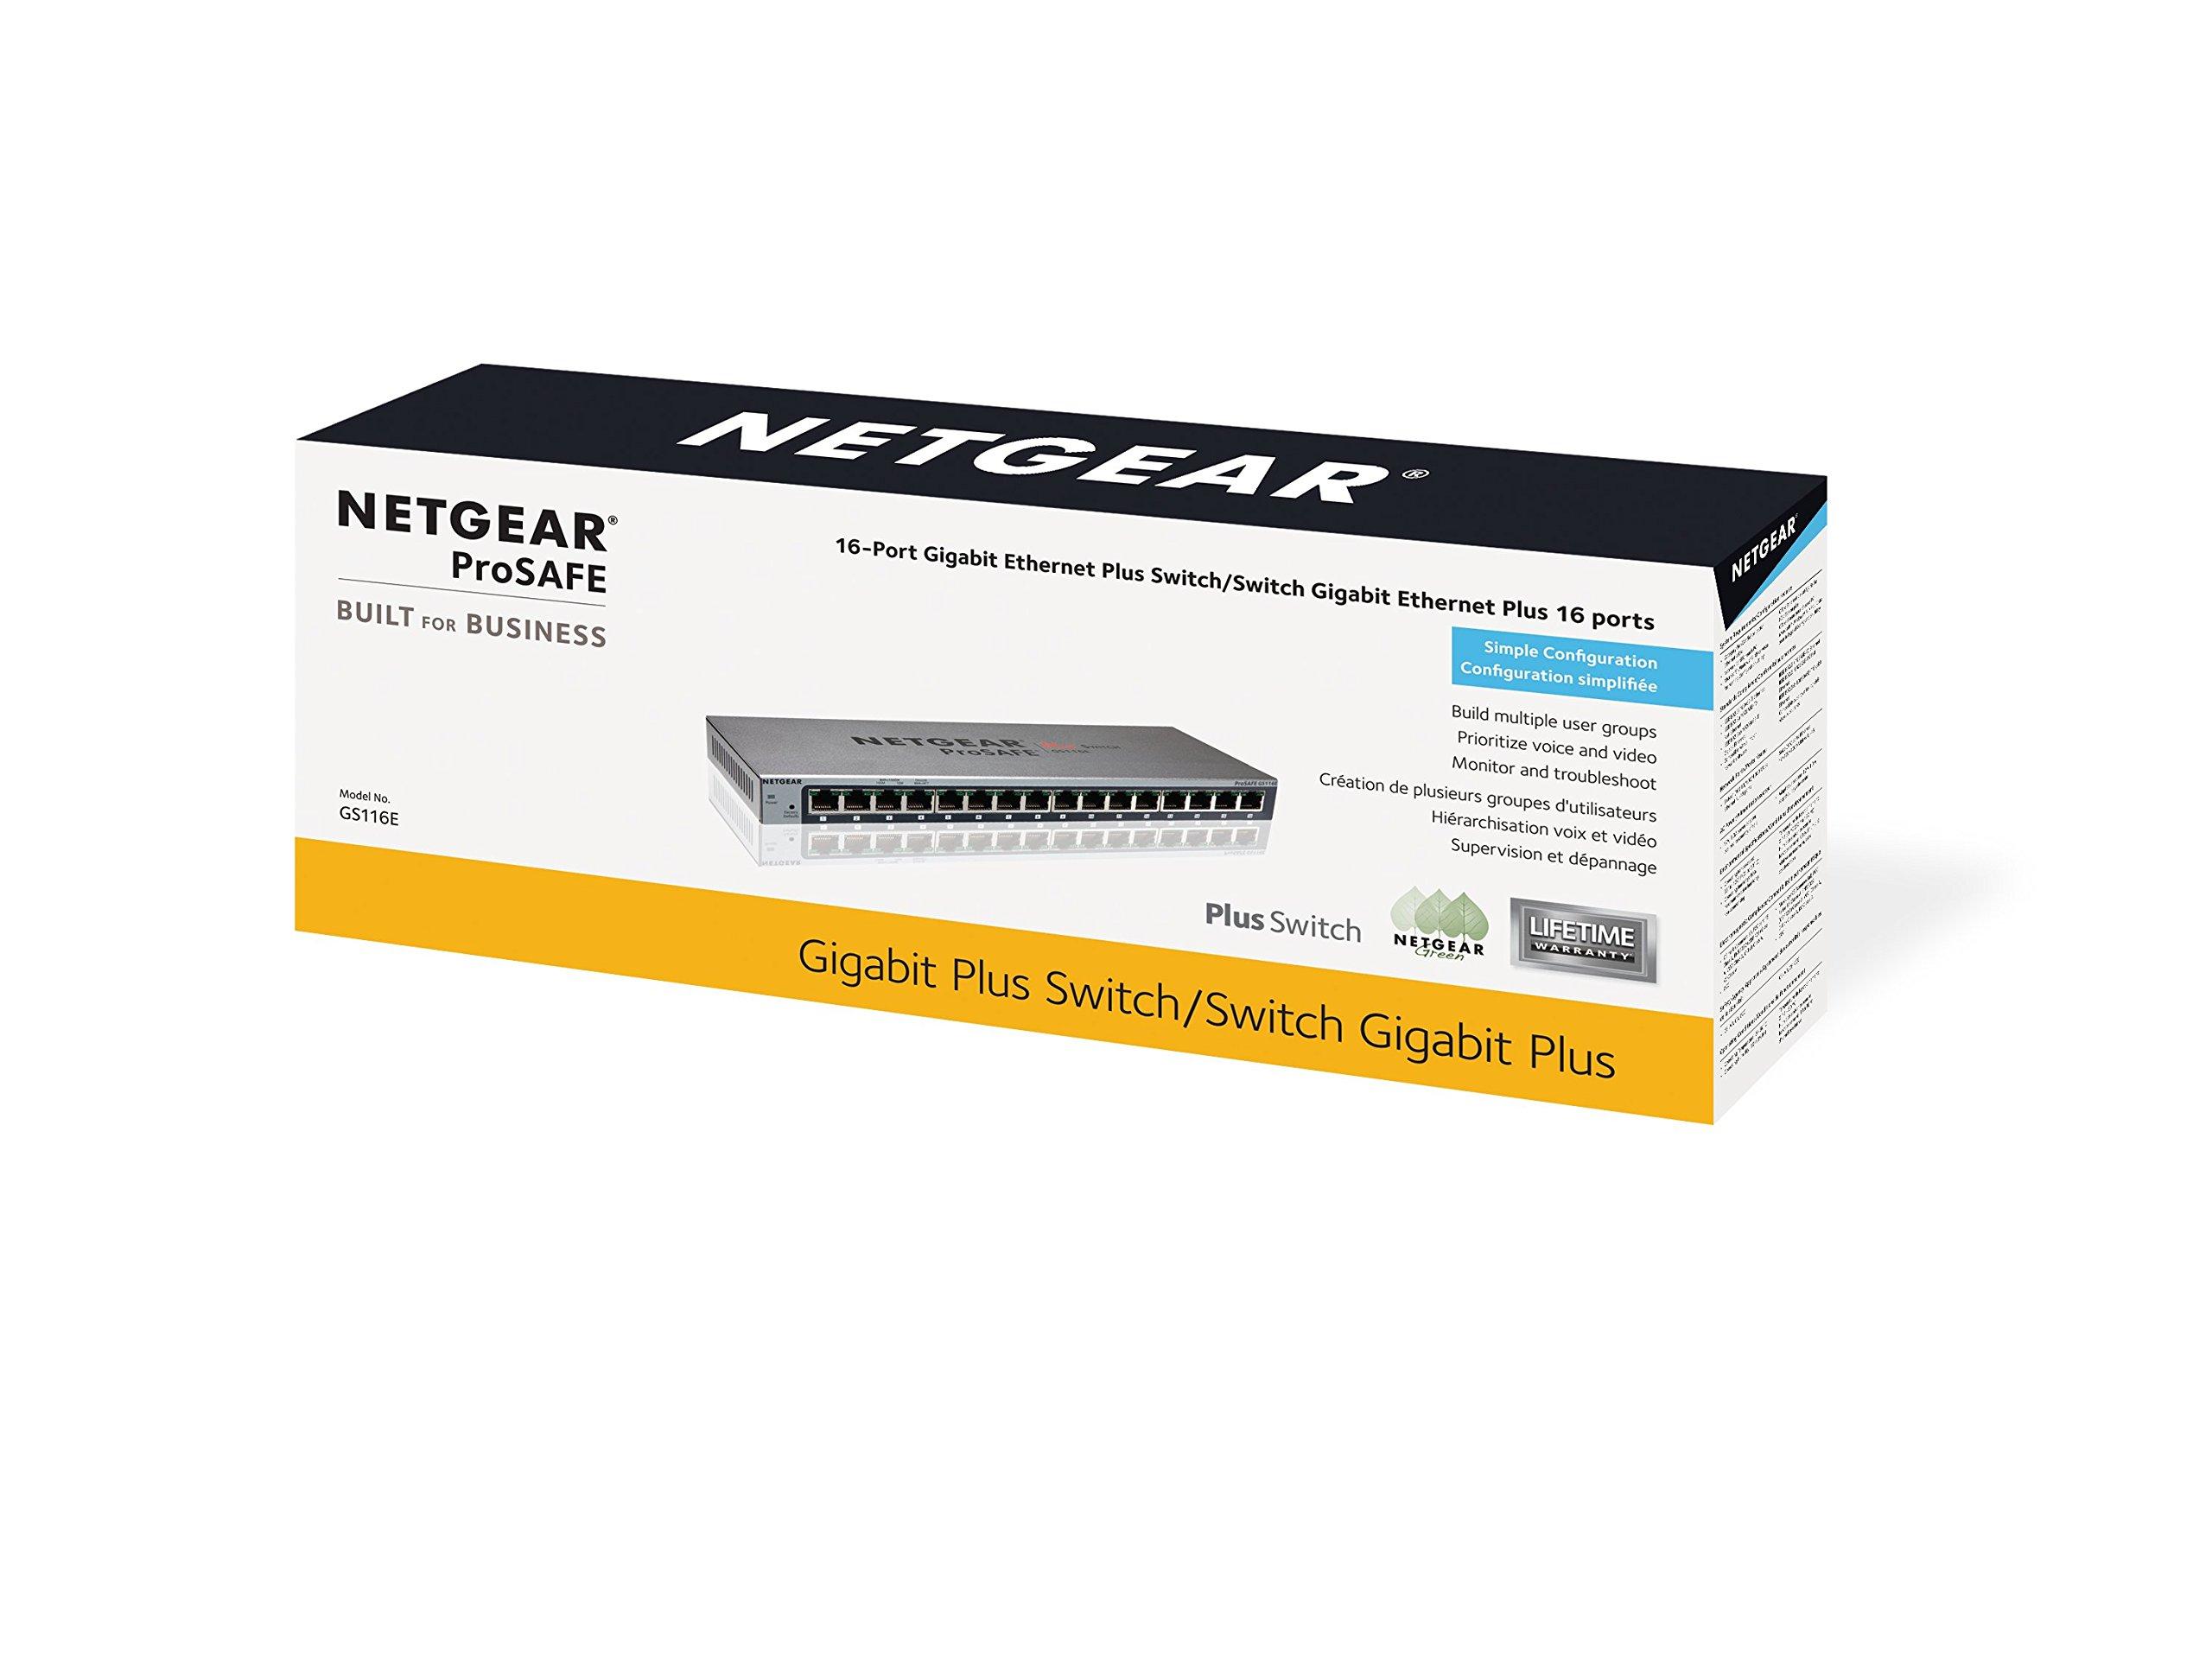 NETGEAR 16-Port Gigabit Smart Managed Plus Switch, ProSAFE Lifetime Protection (GS116Ev2) (GS116E-200NAS)